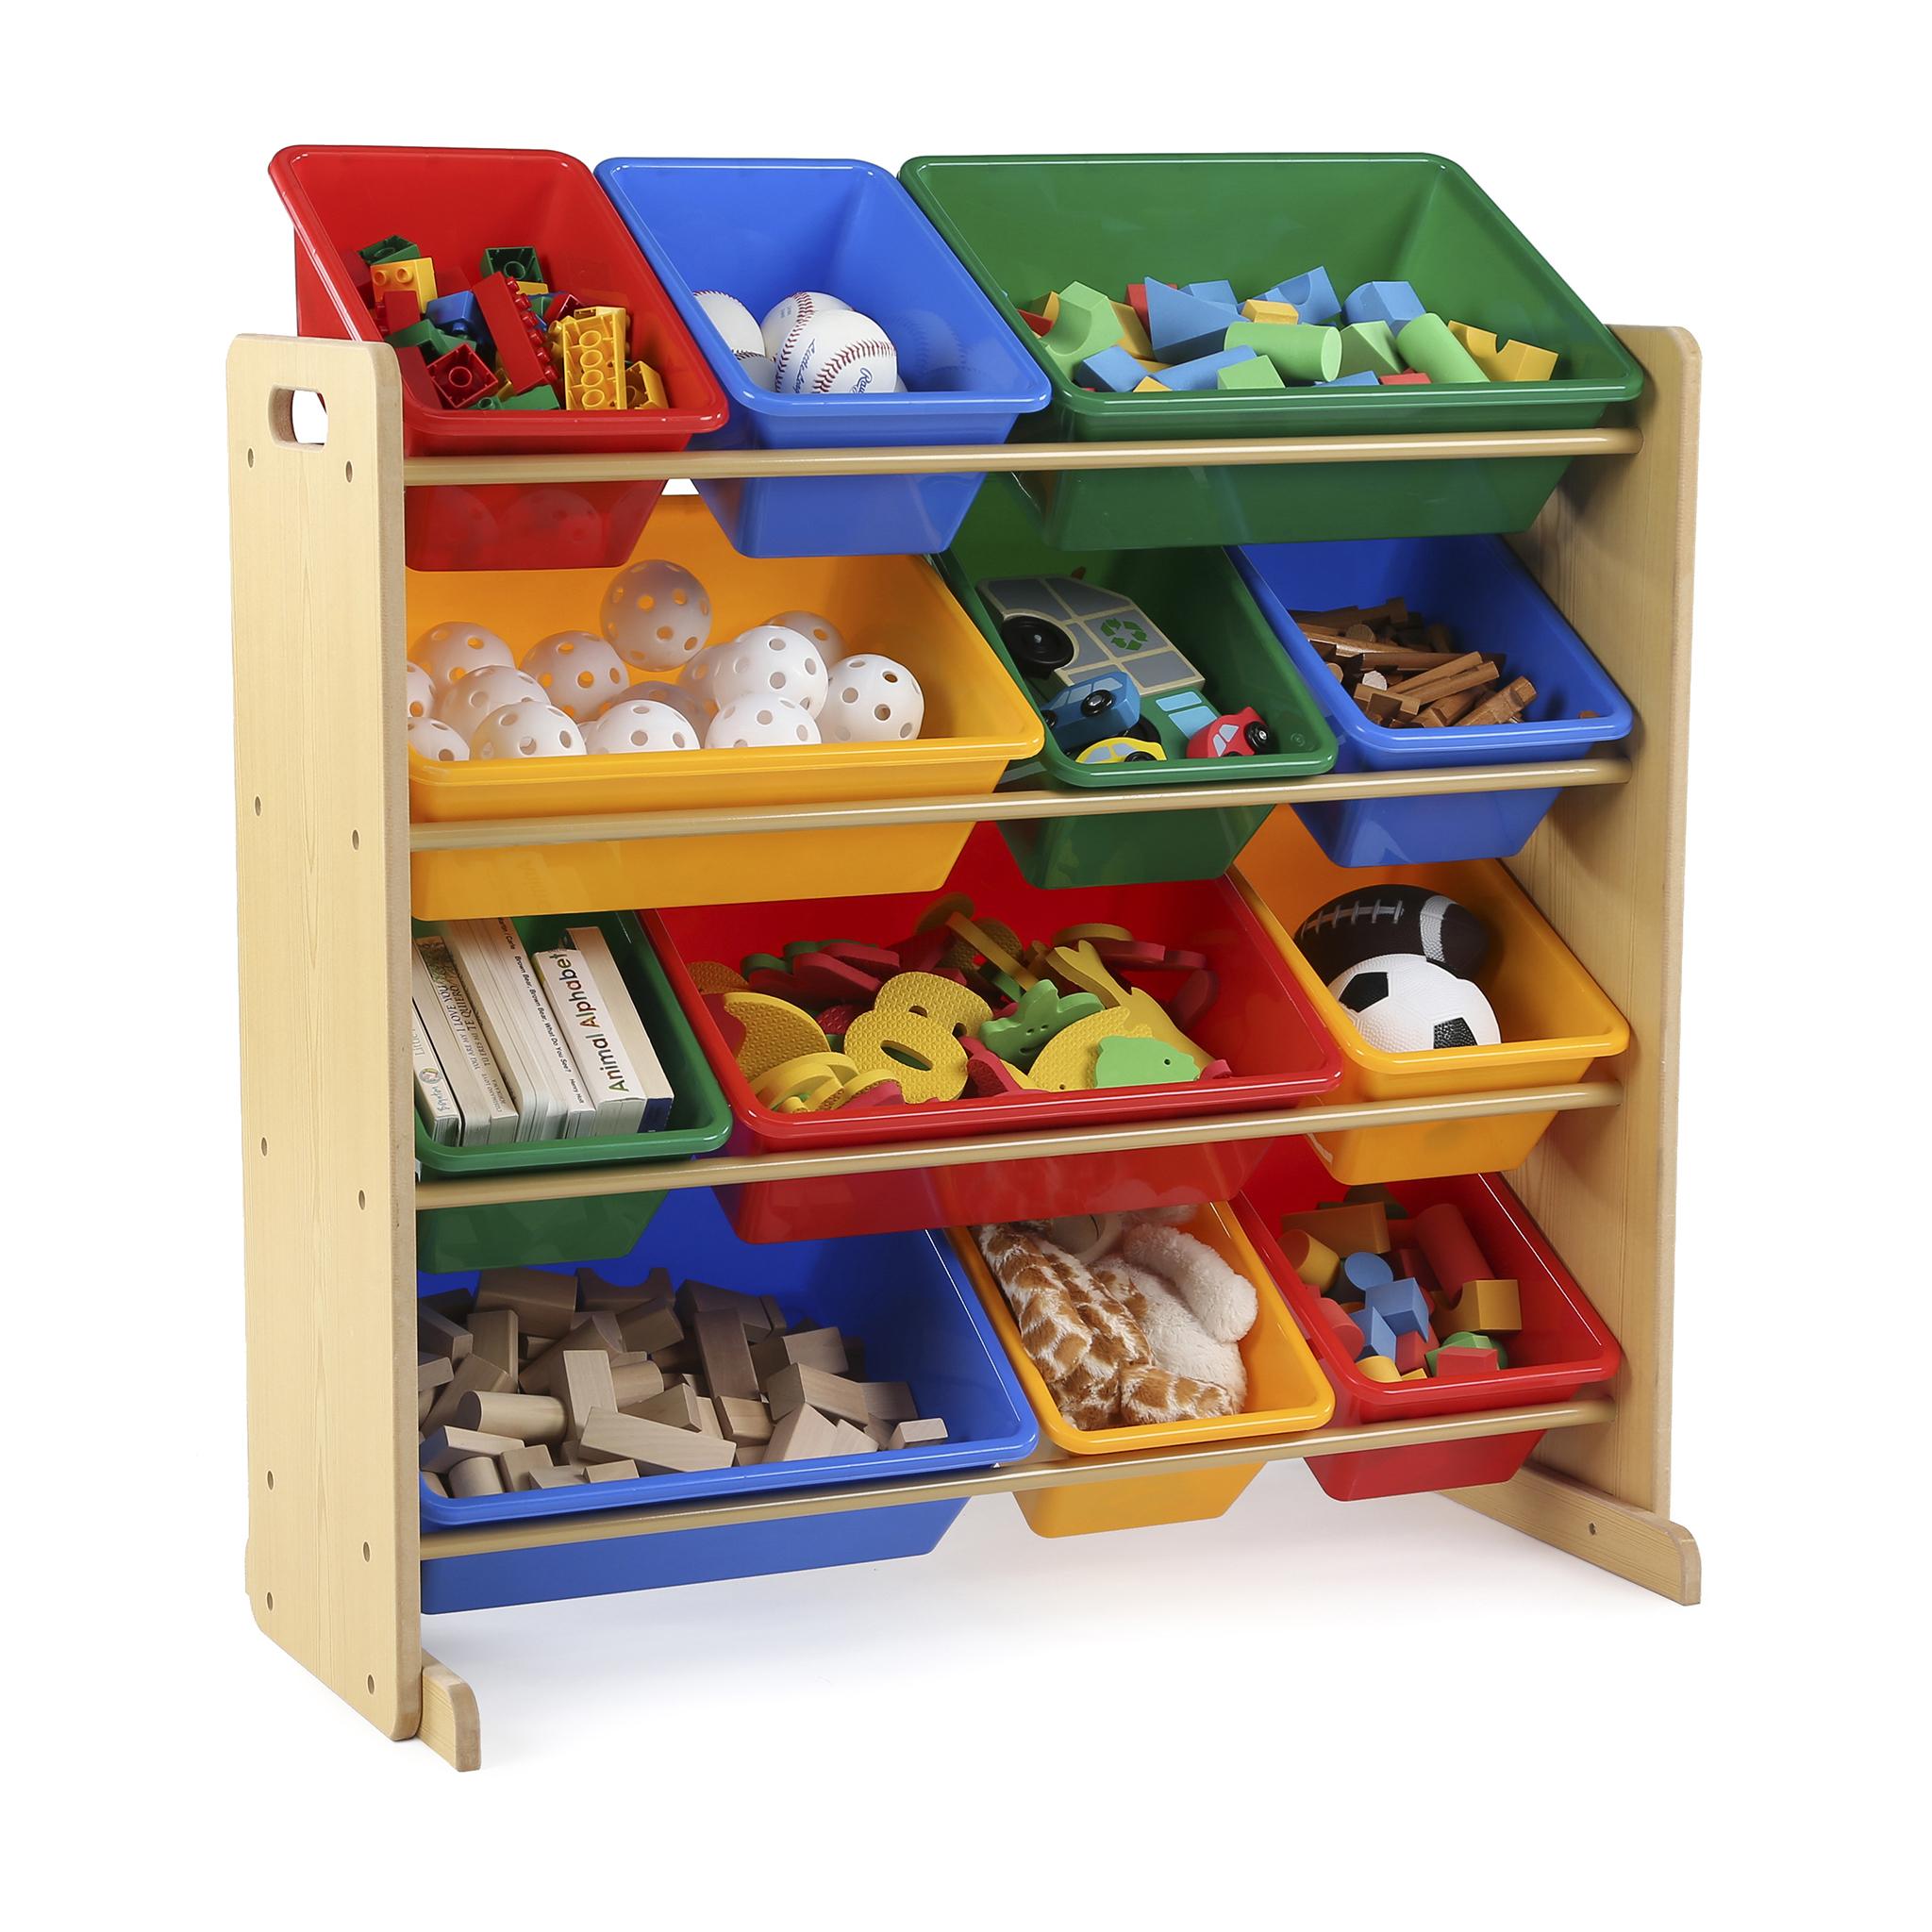 tot tutors kids toy storage organizer with 12 plastic bins, multiple VVNBUTK